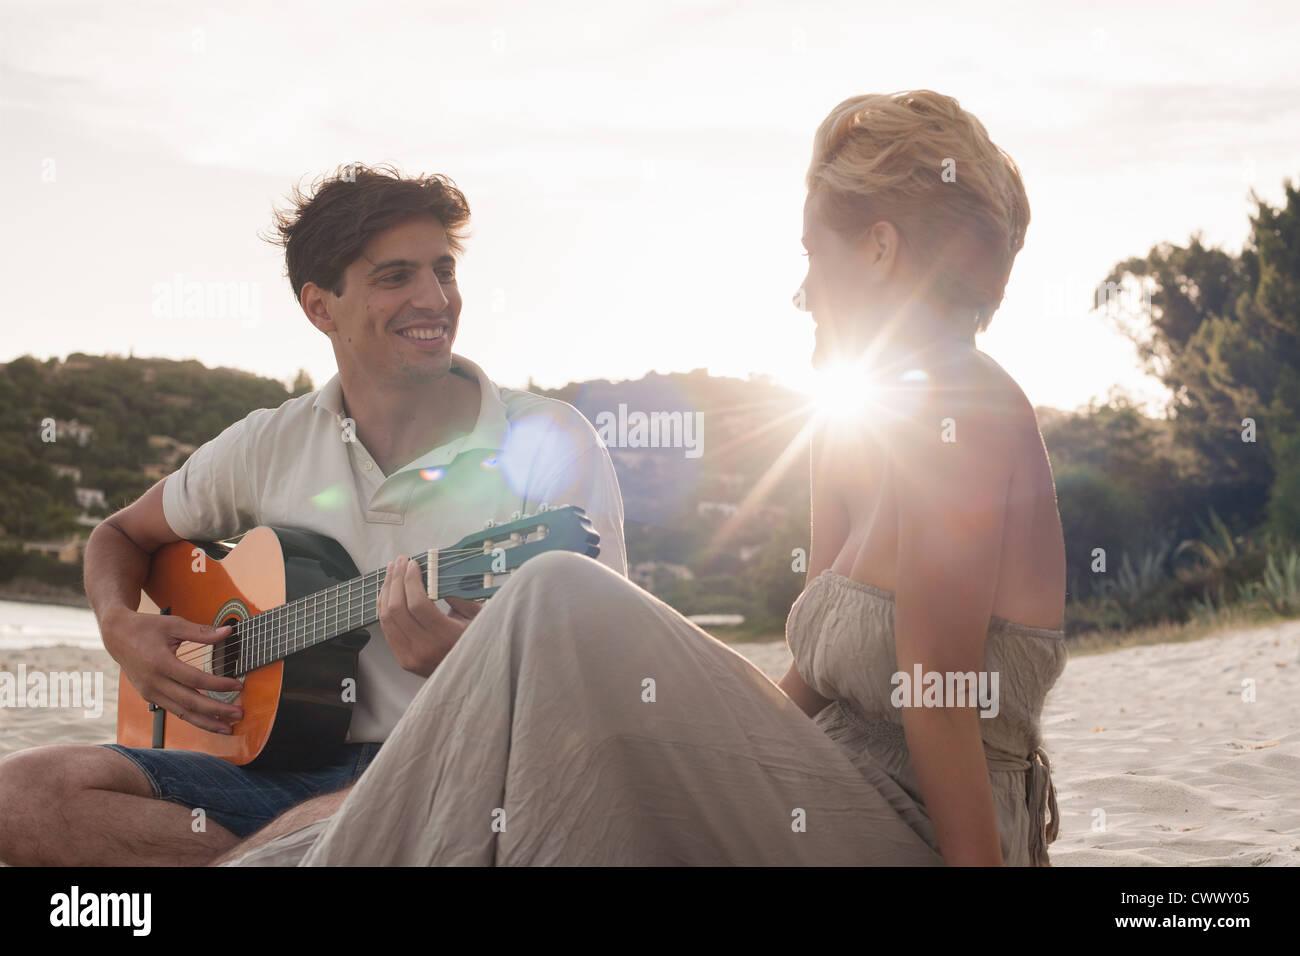 El hombre tocando la guitarra para novia Imagen De Stock